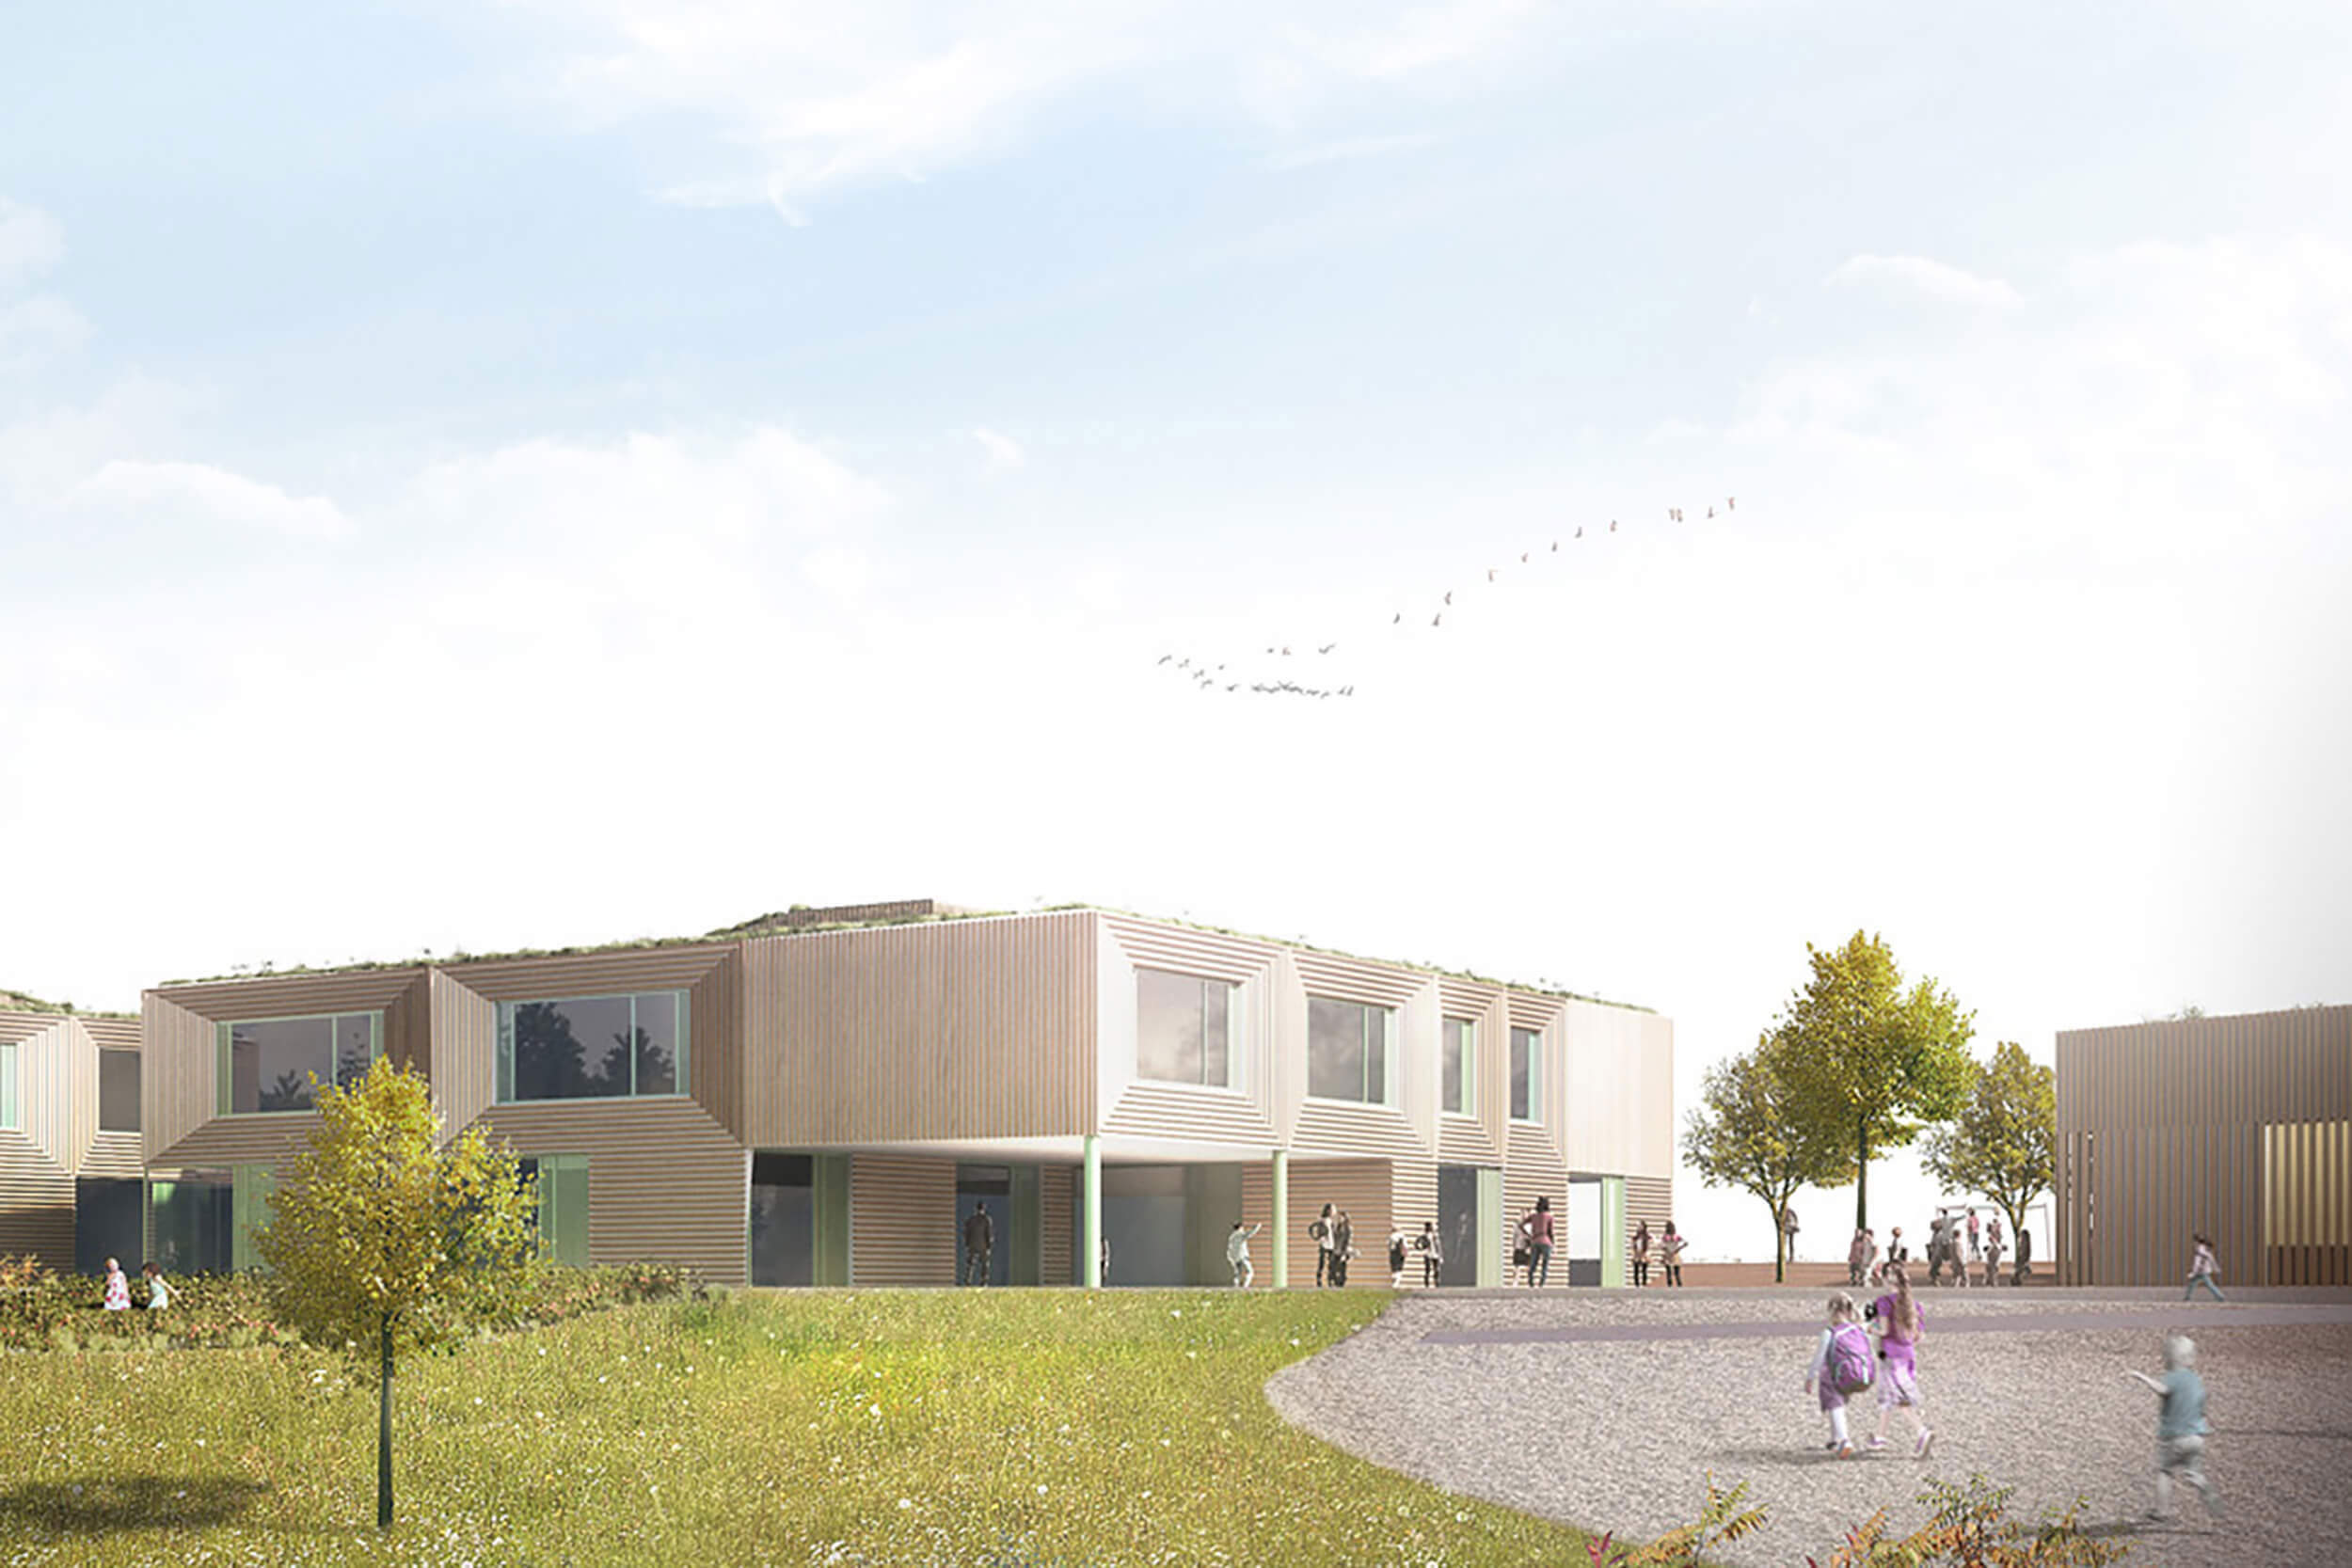 Campus Scolaire Et Sportif Visualisierung